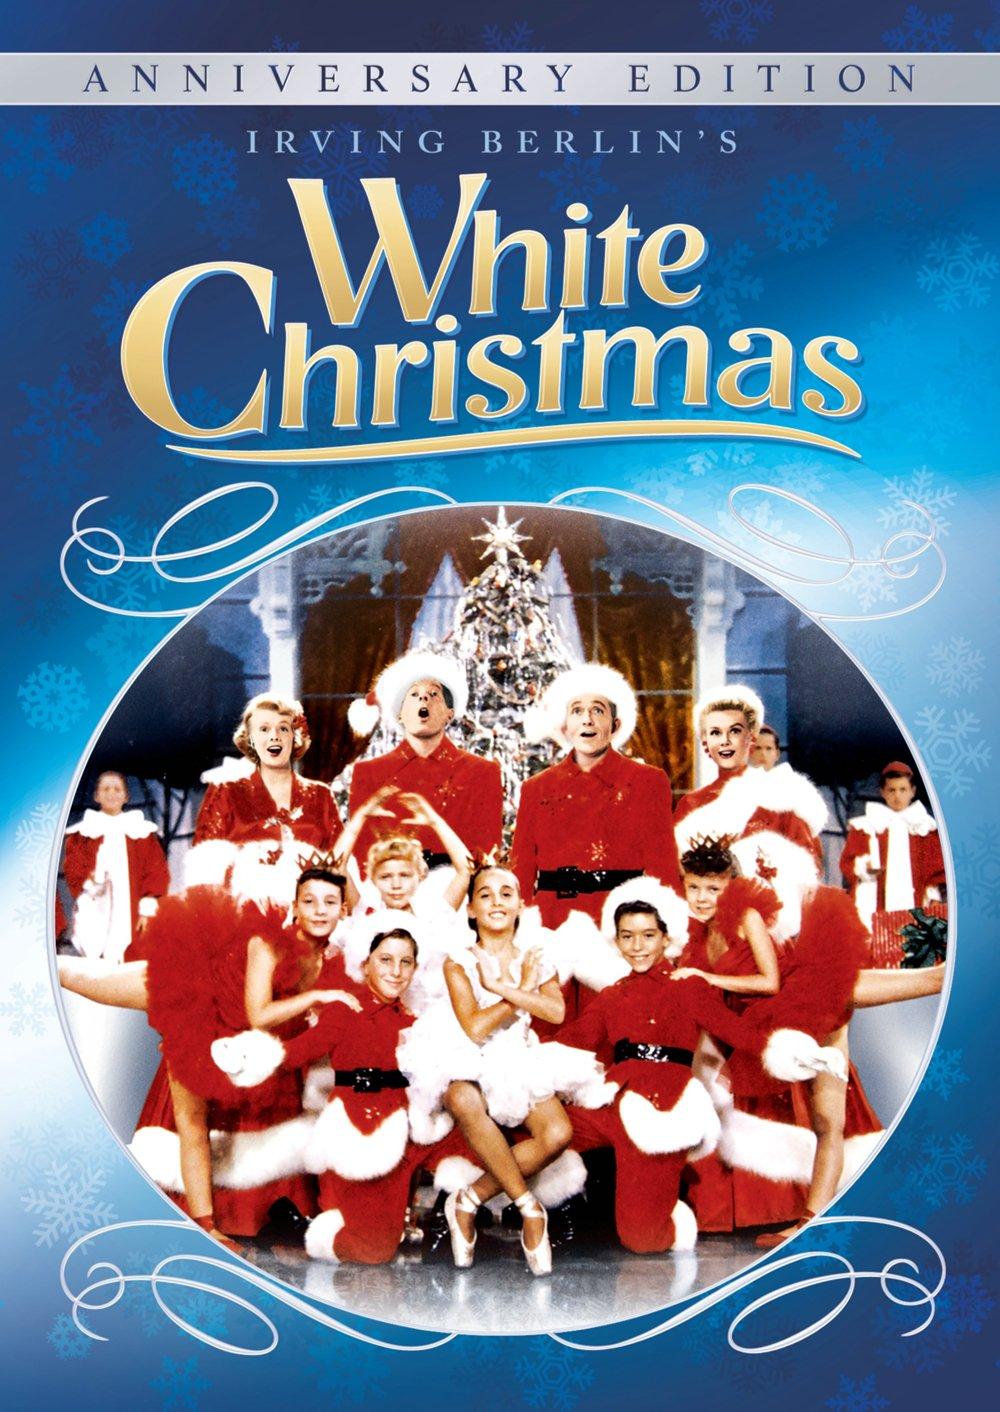 White Christmas 1954.Amazon Com White Christmas Anniversary Edition Bing